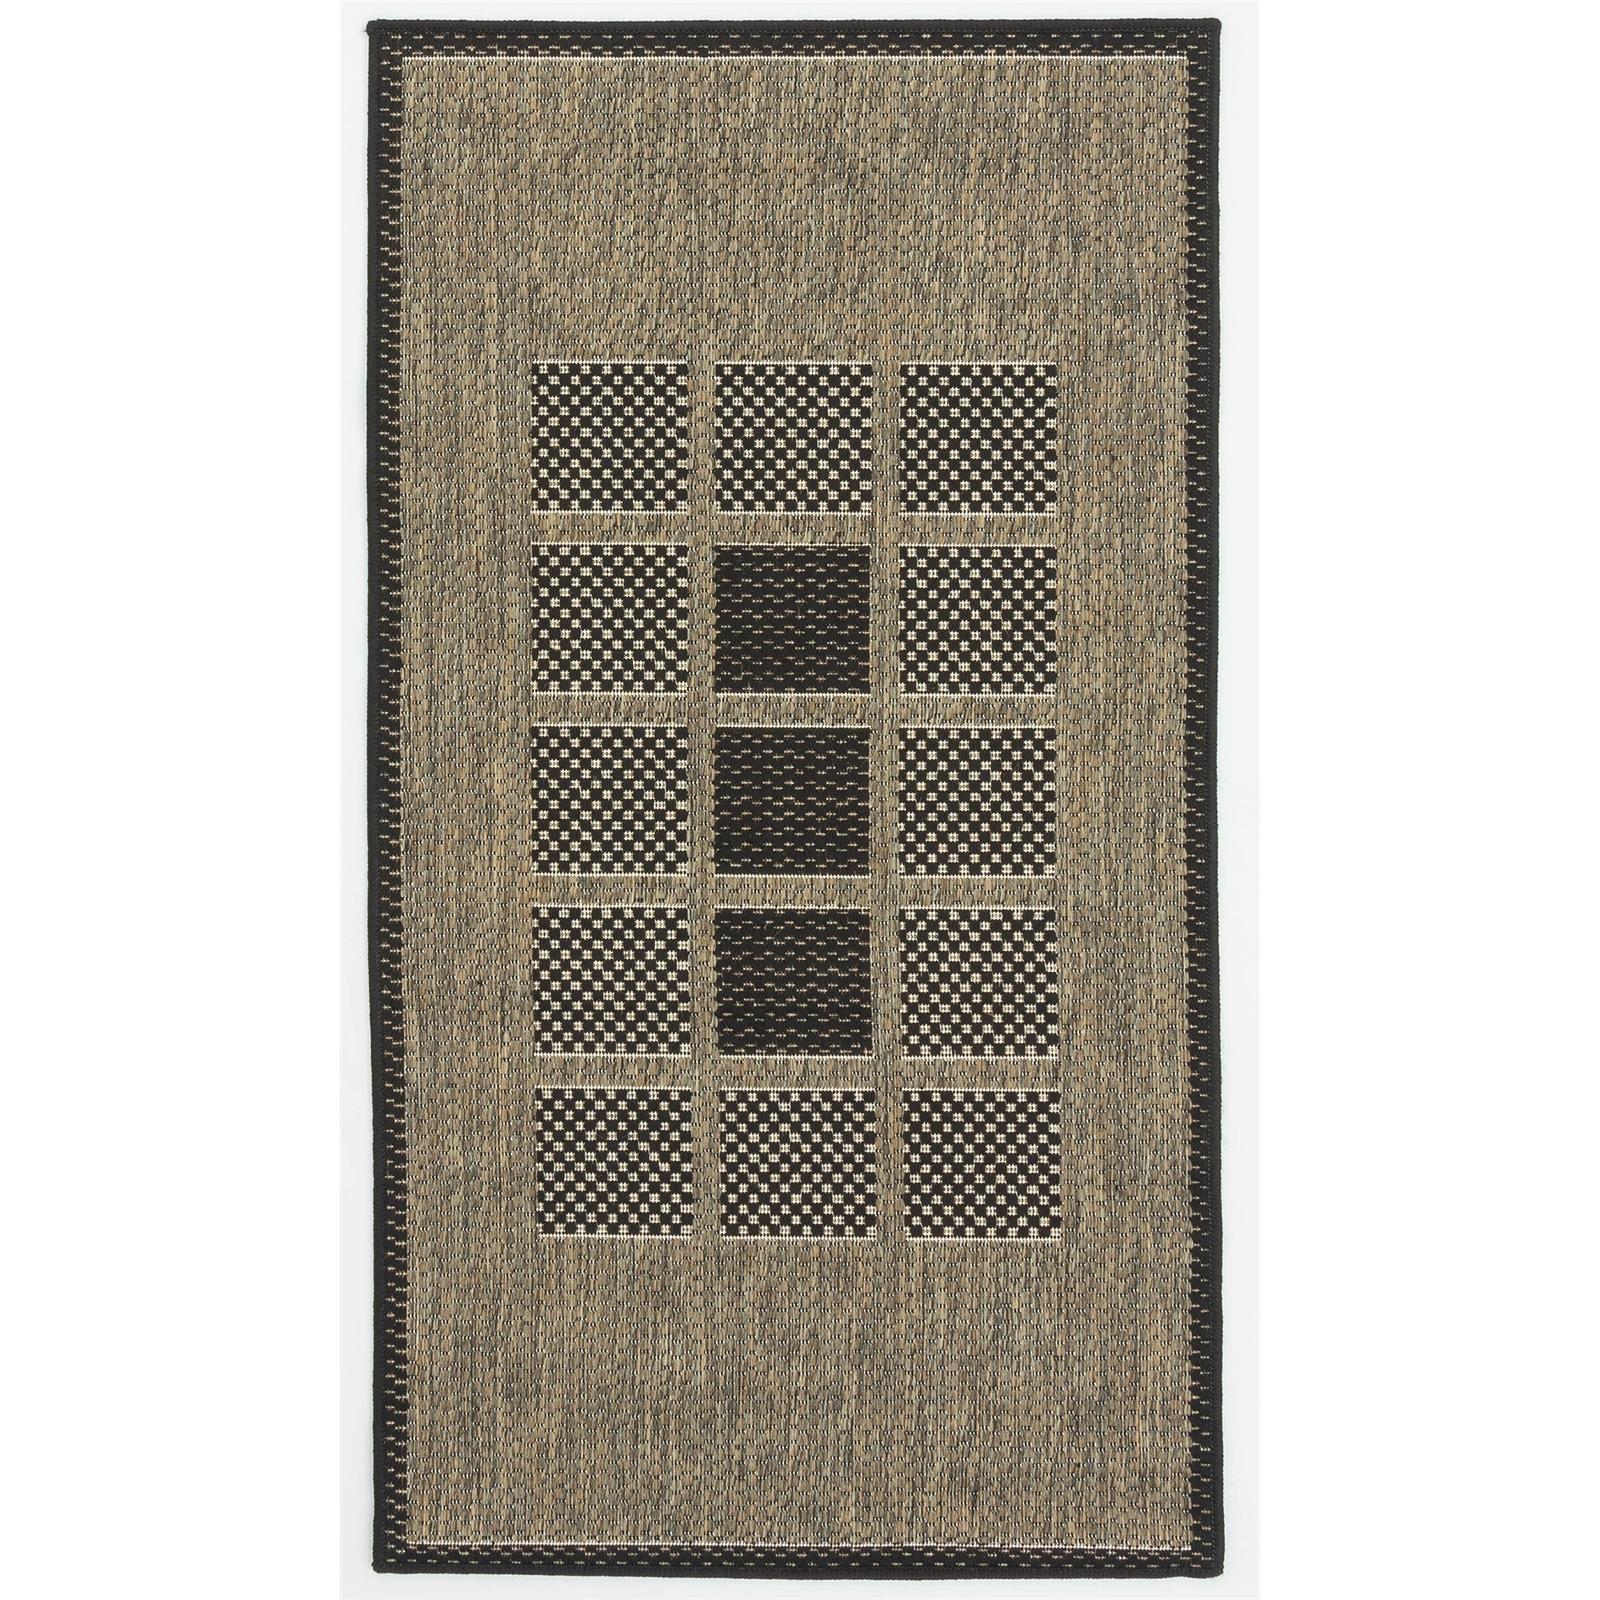 Hufflett 80 x 150cm Grey Windows Ceduna Polypropylene Flat Weave Rug